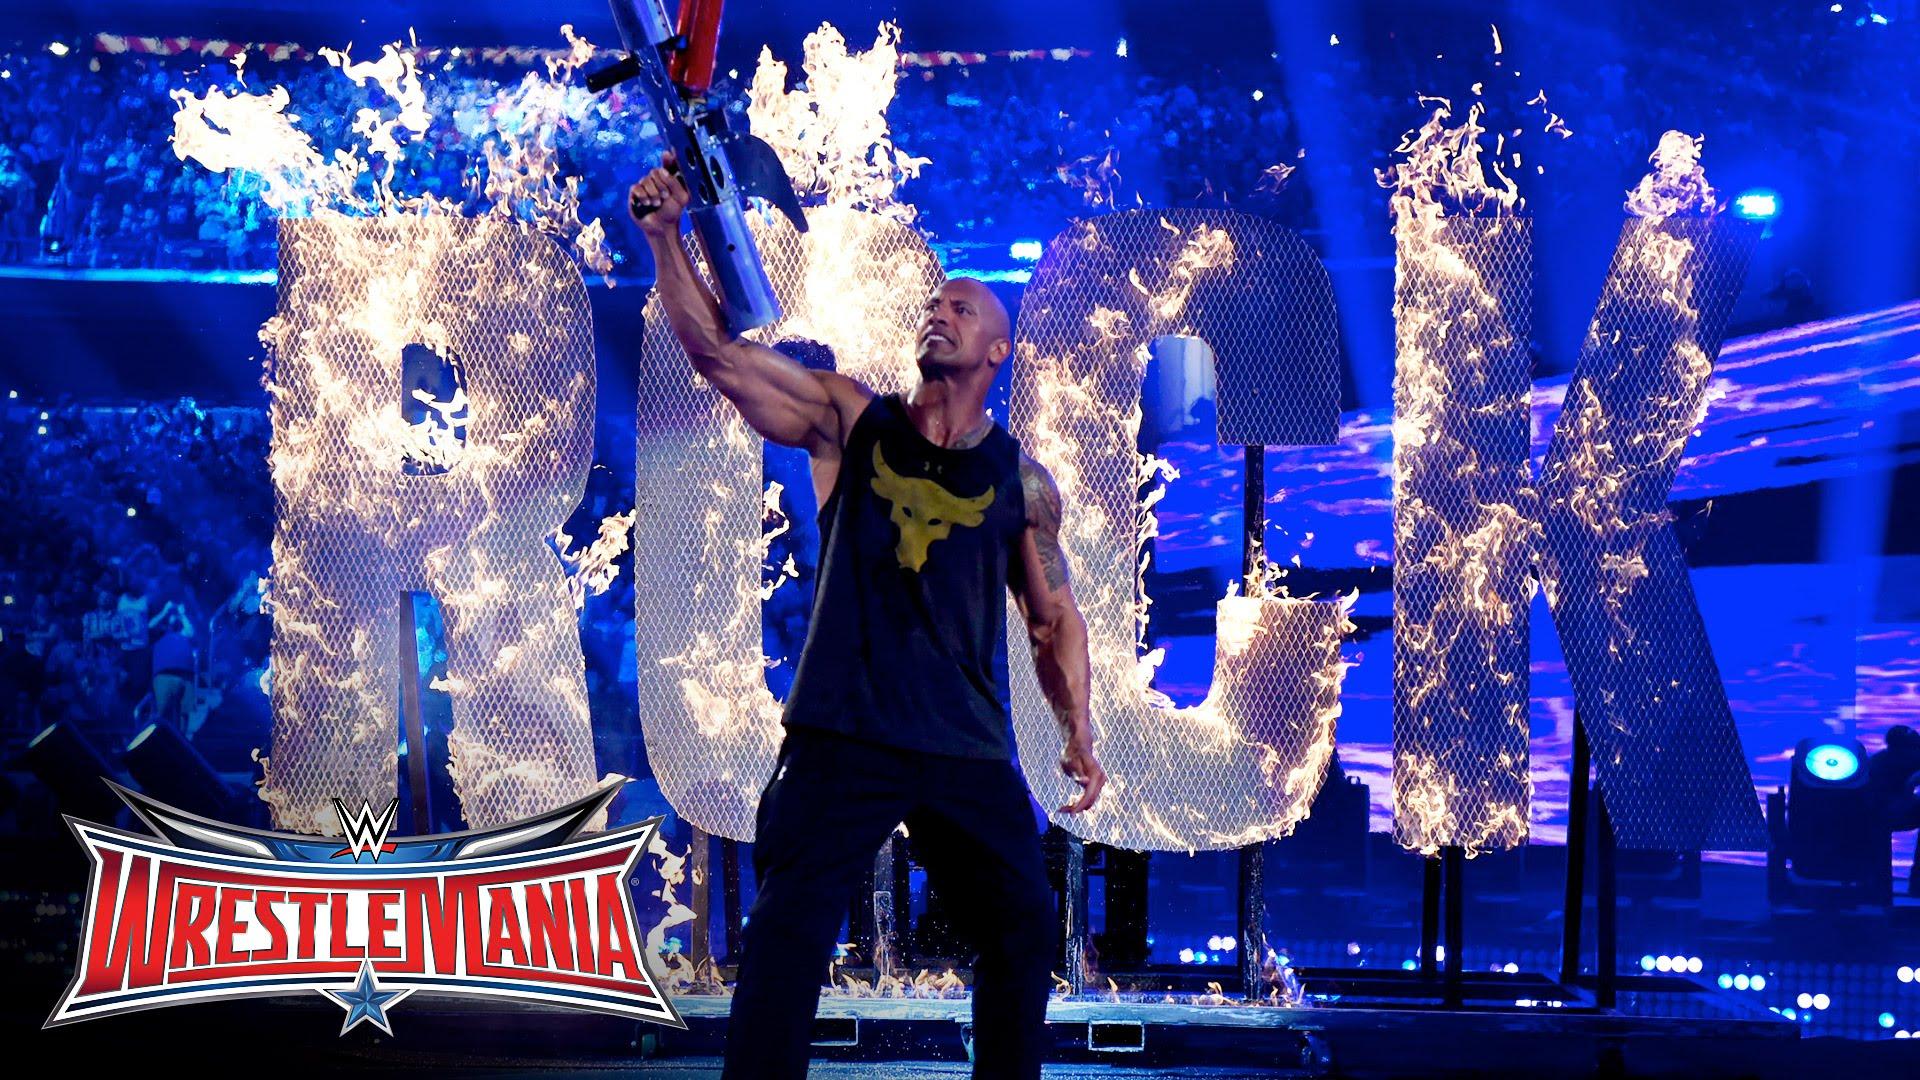 the rock flamethrower